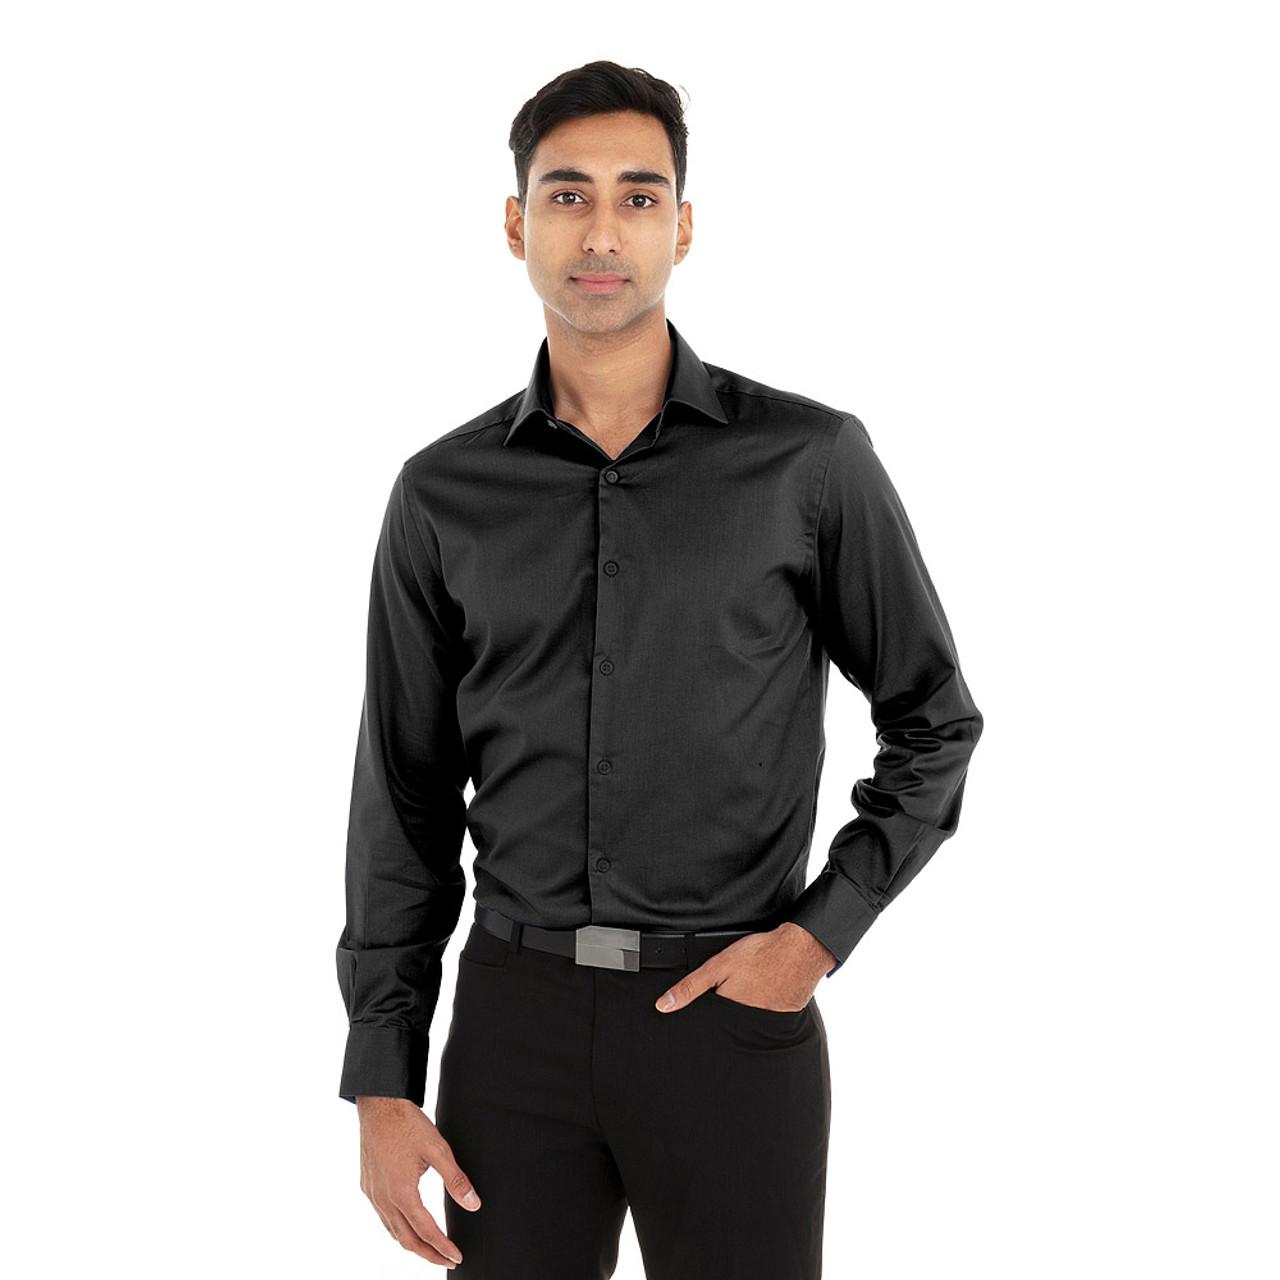 Black - 18CV316 Van Heusen Long Sleeve Dress Twill Shirt   T-shirt.ca